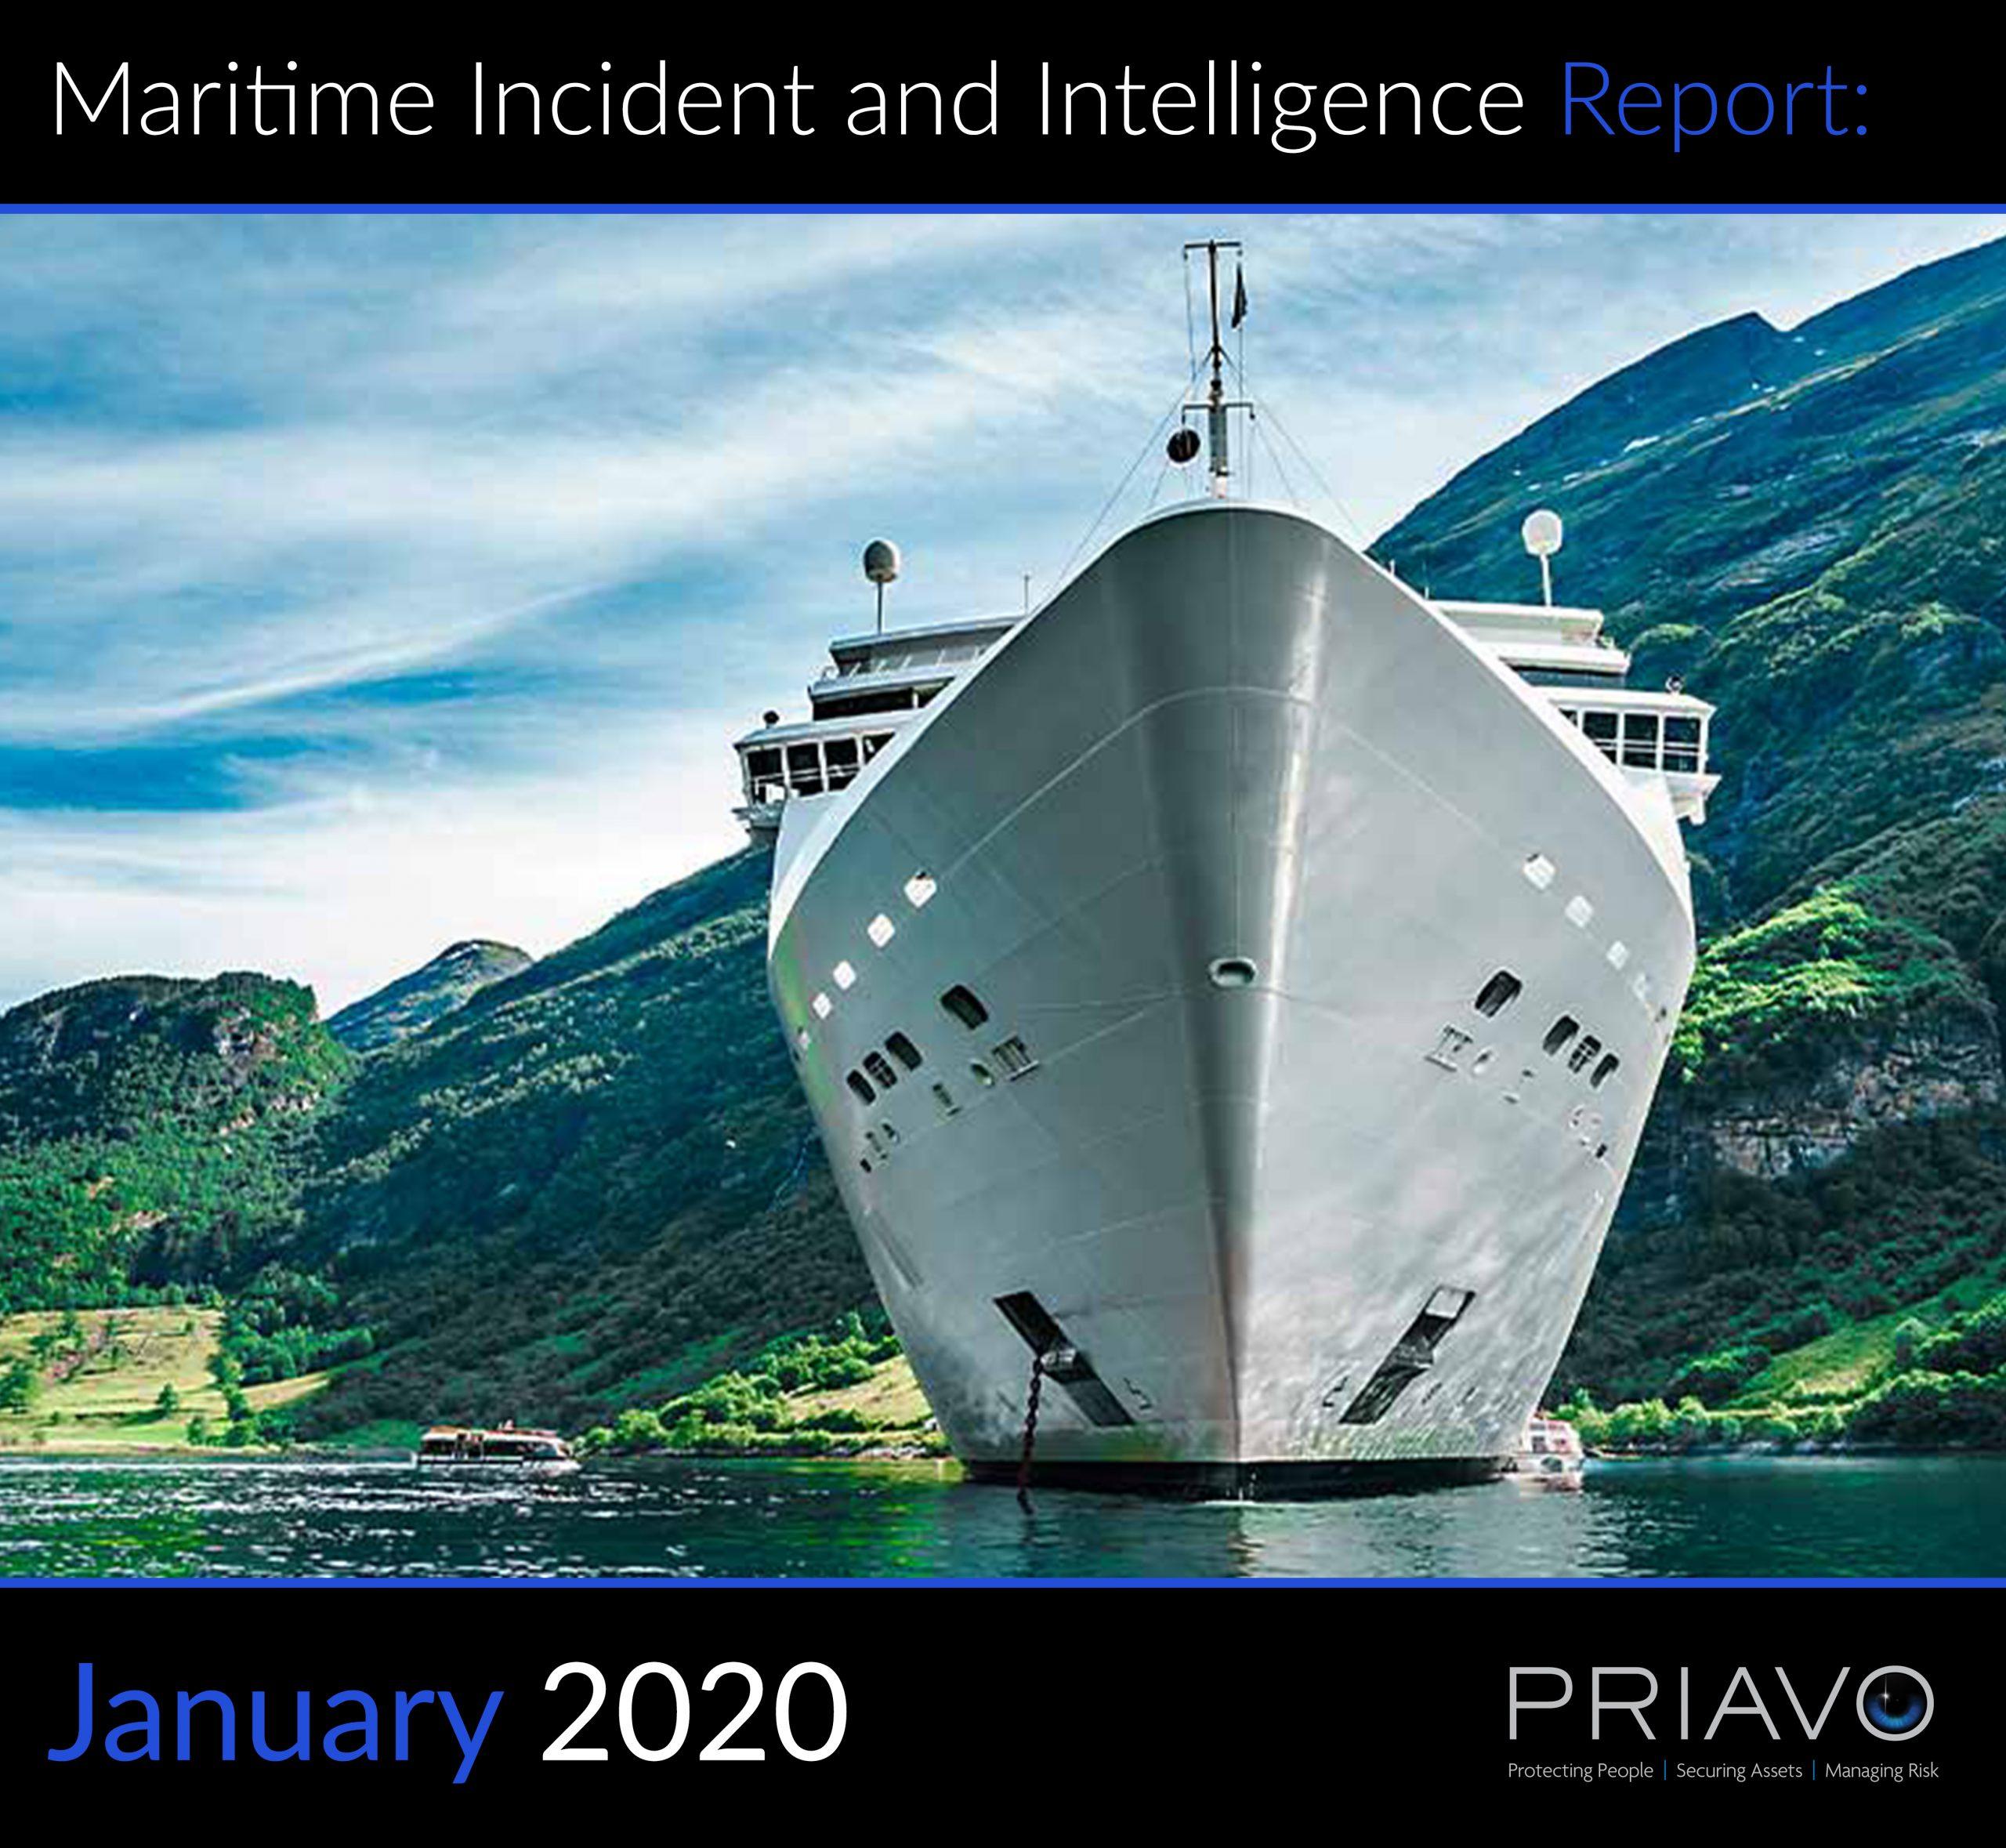 Maritime Incident Report: January 2020